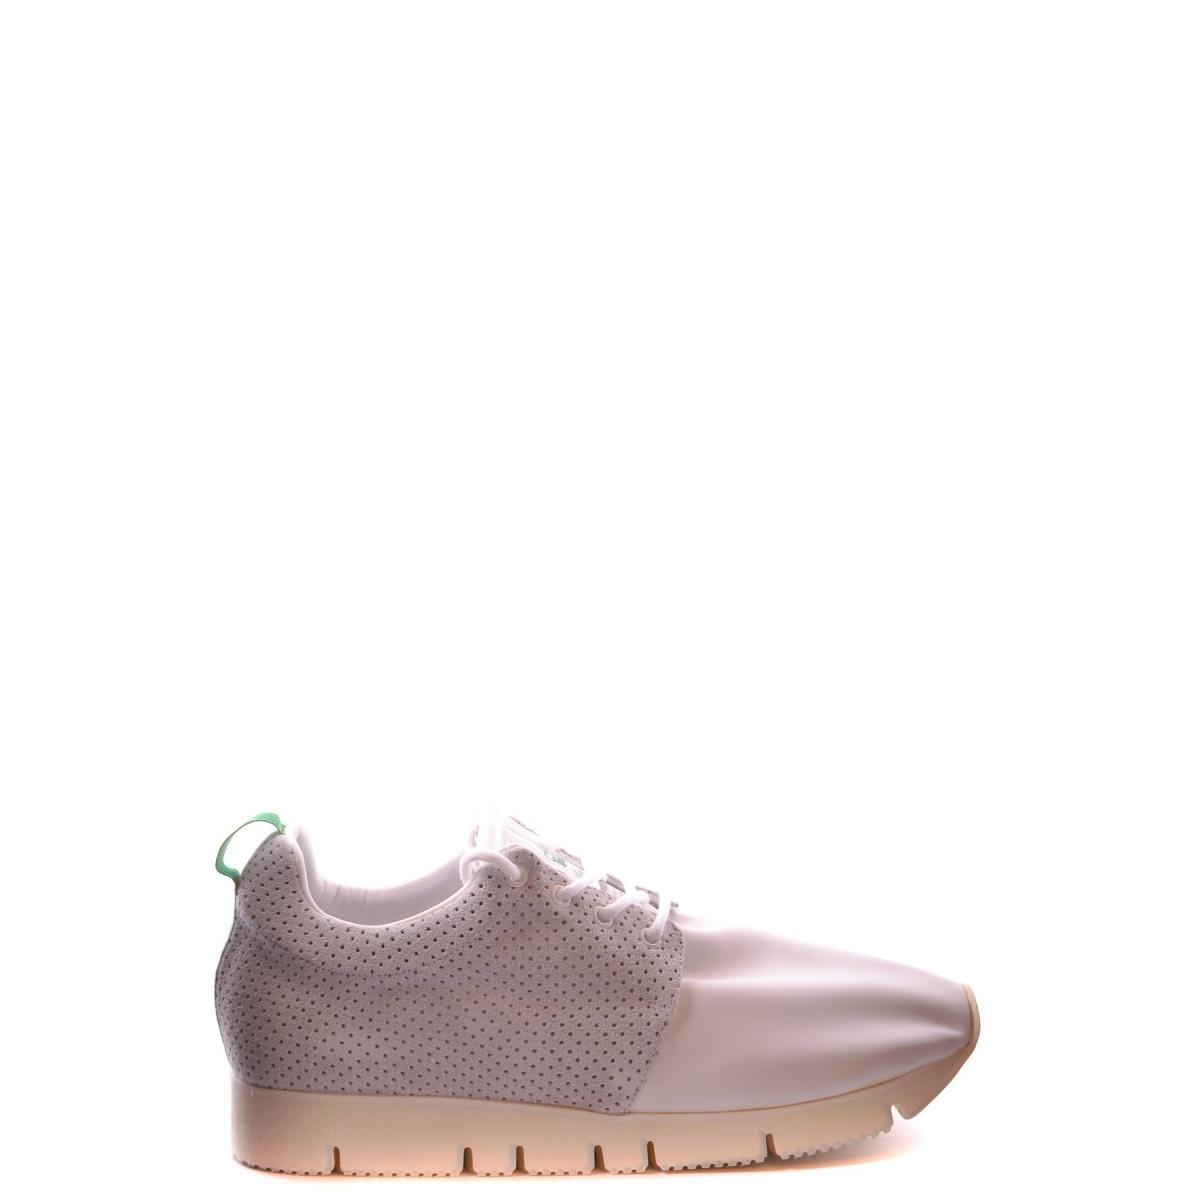 Sneakers -50% Leather Crown ENN040 20544IT -50% Sneakers 559a88